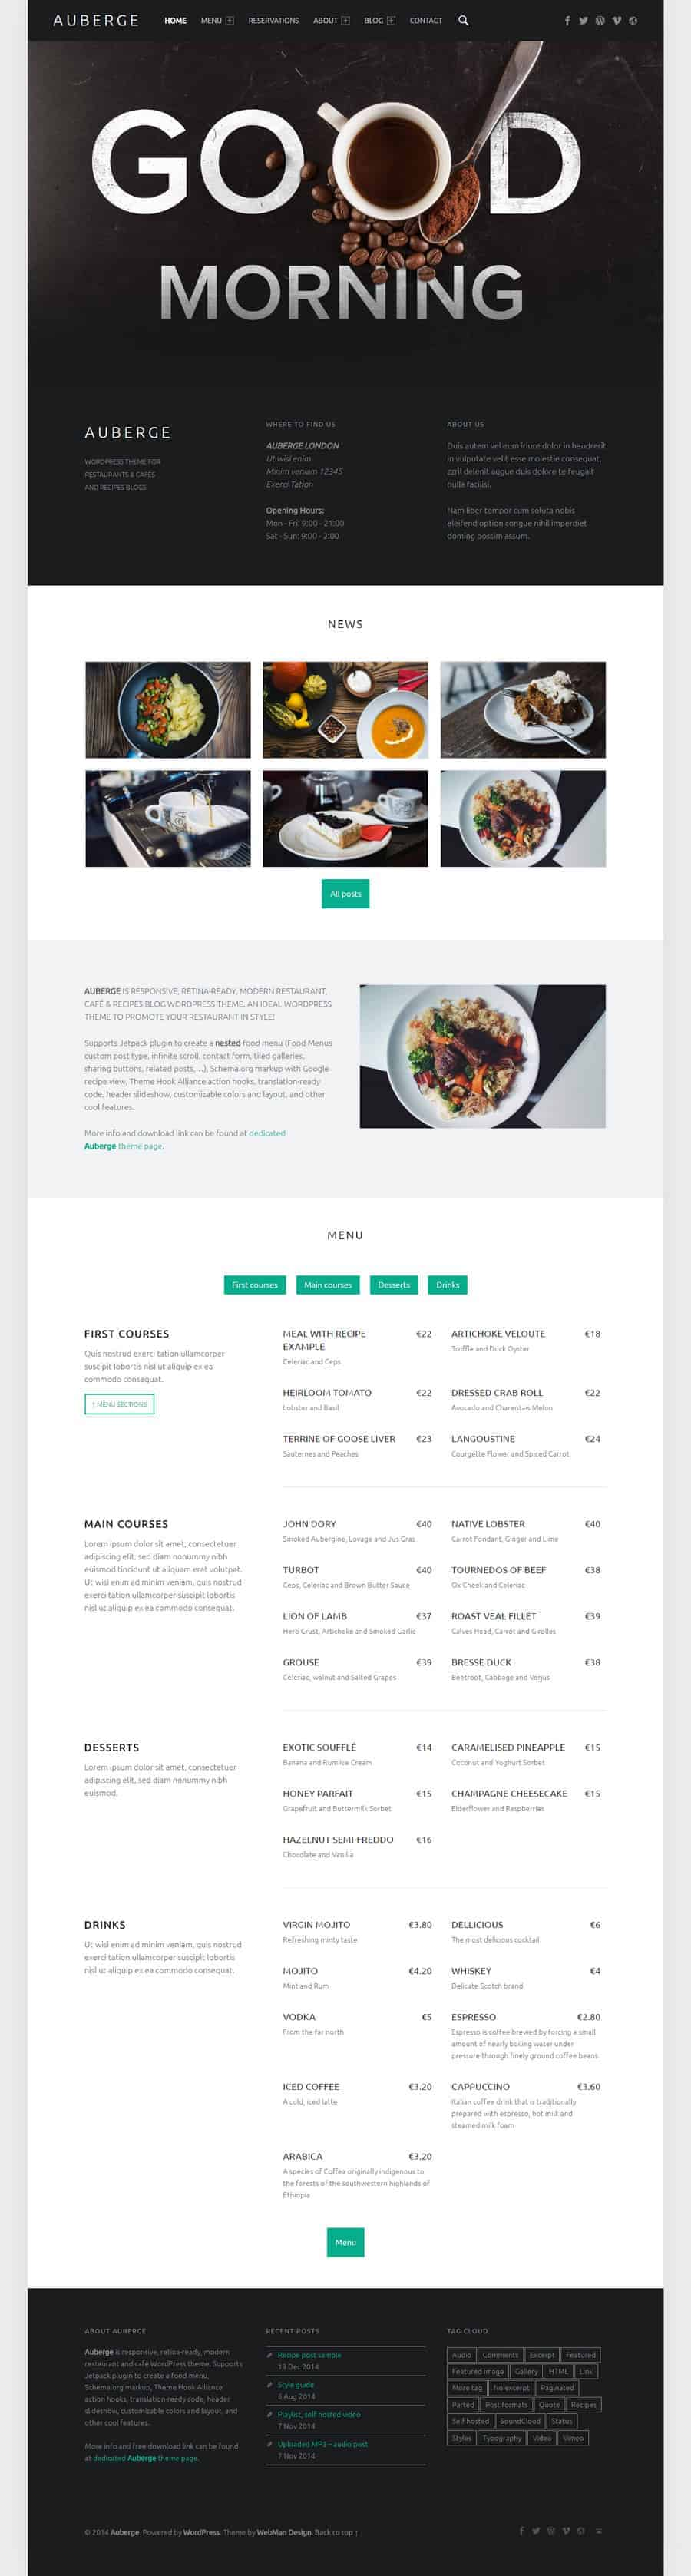 Auberge - free WordPress theme for restaurants